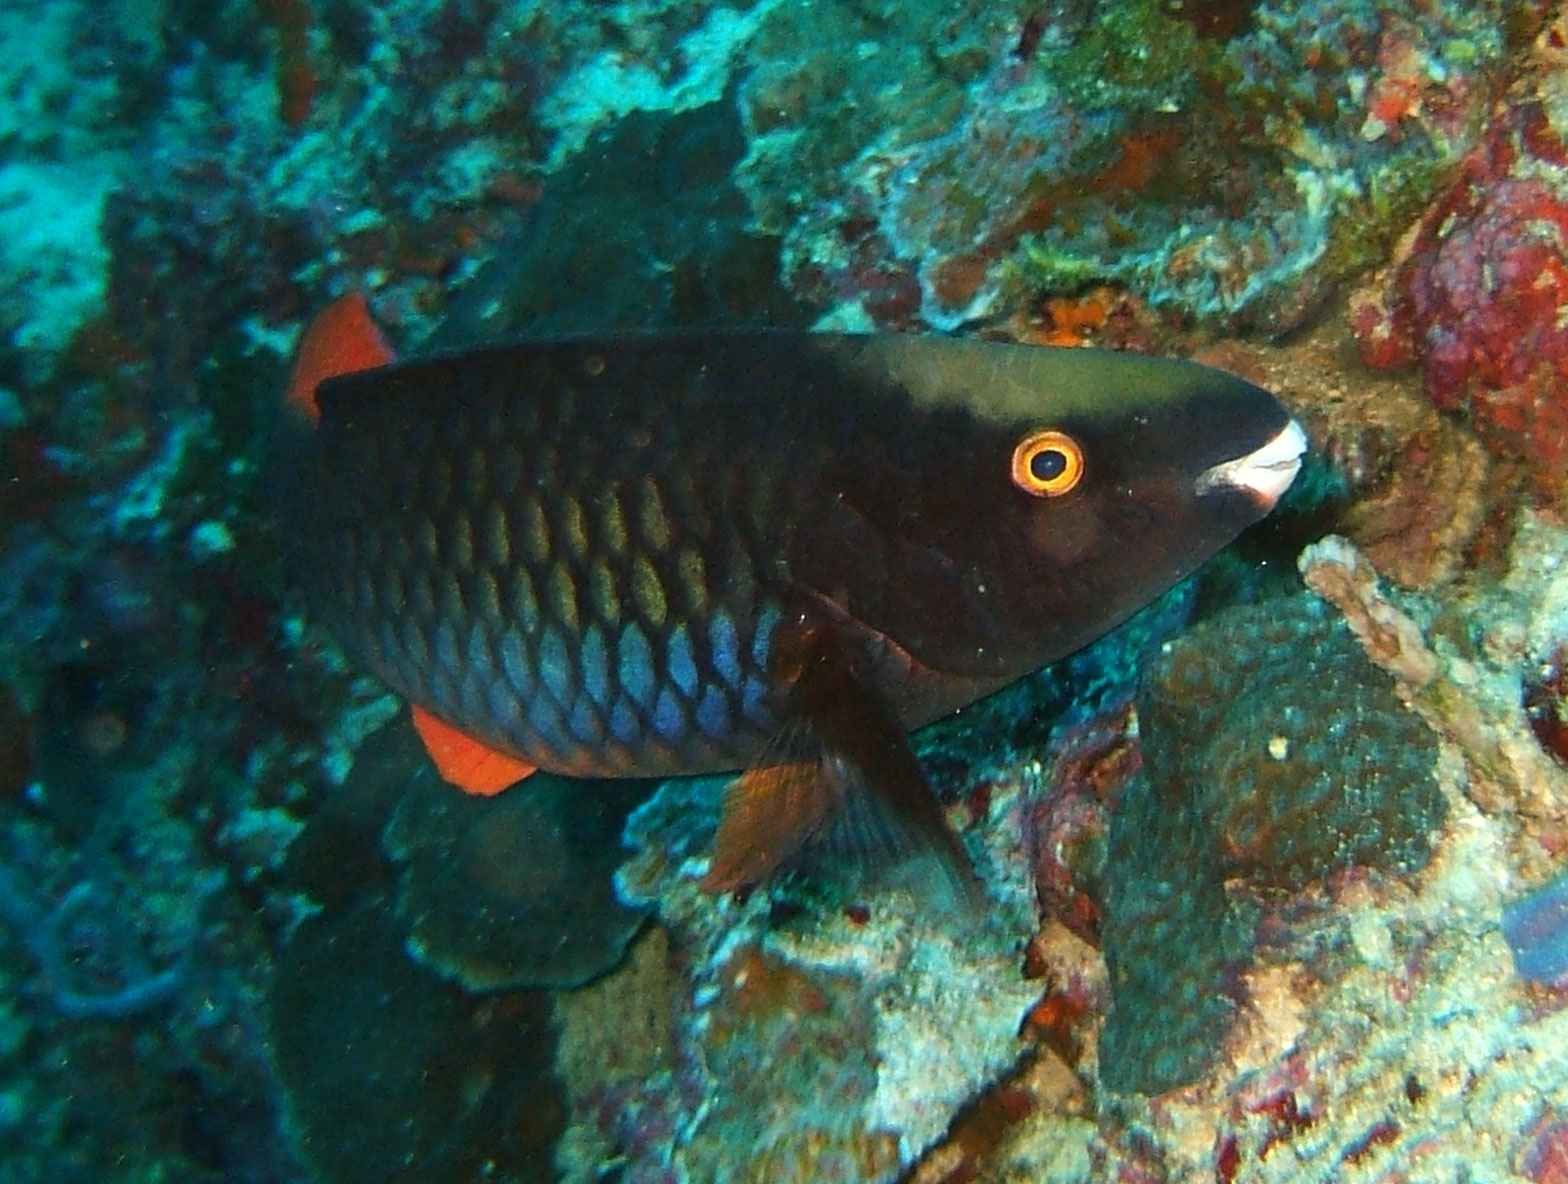 Philippines Cebu Moal Boal 20051227 Dive 1 Pescador Island 12